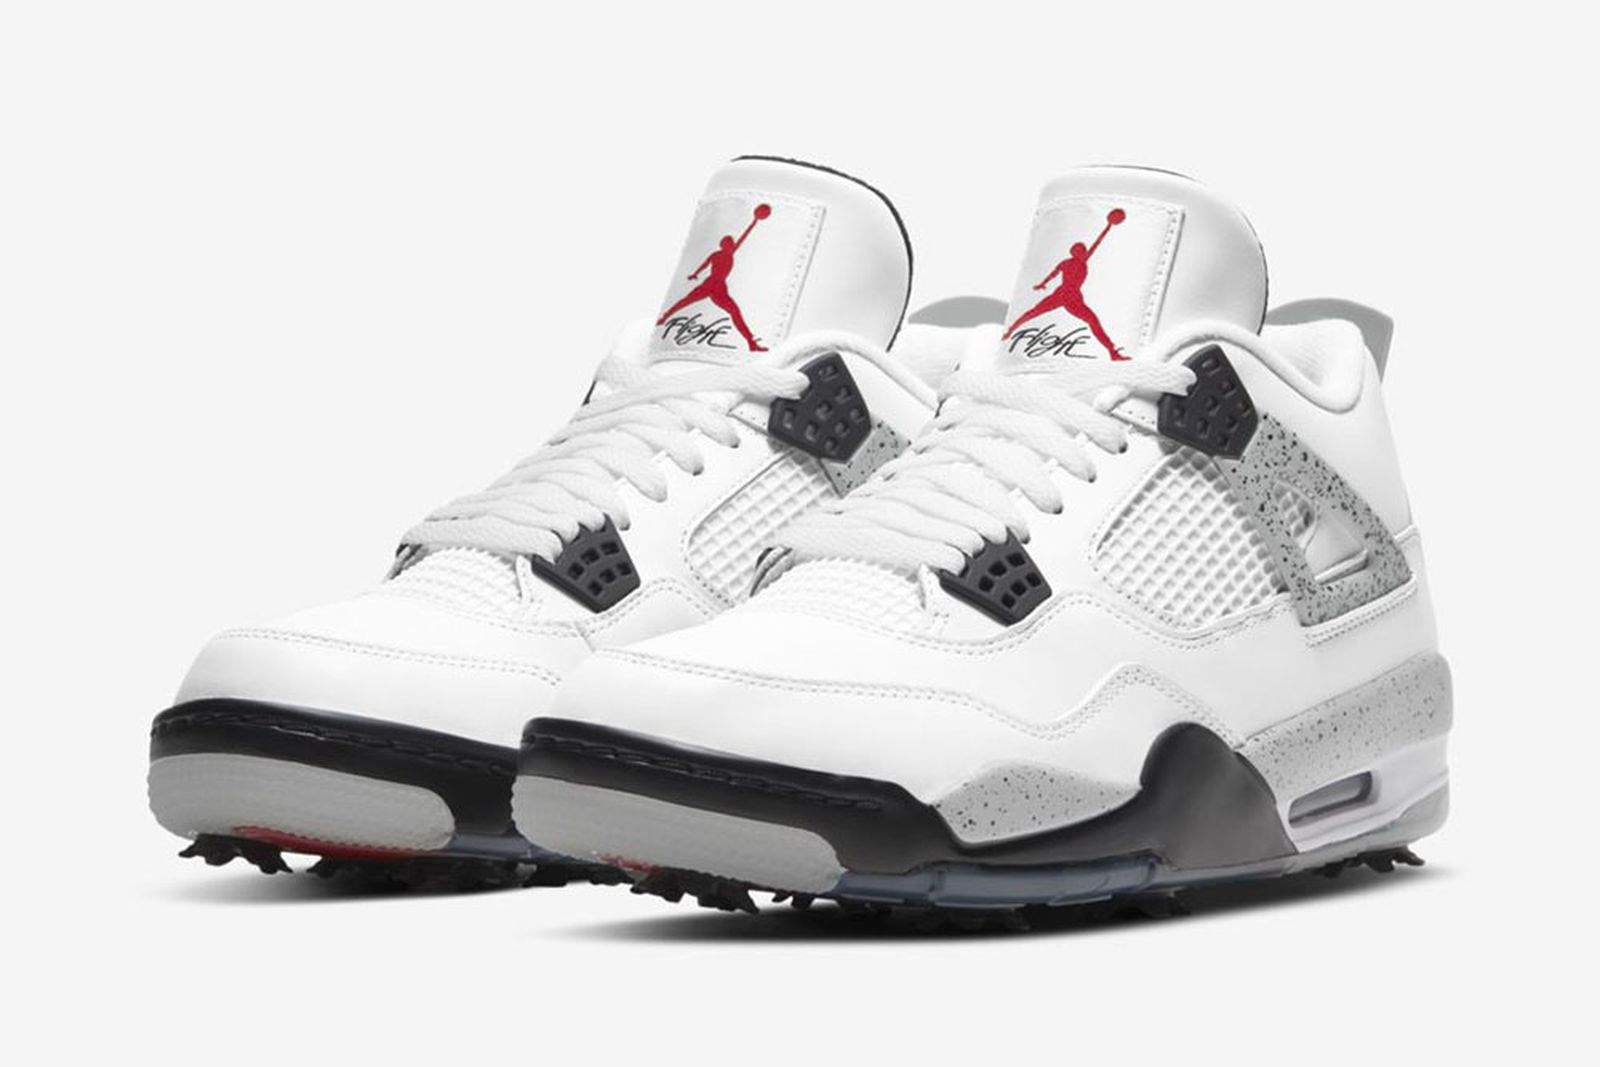 air-jordan-4-golf-white-cement-release-info-00